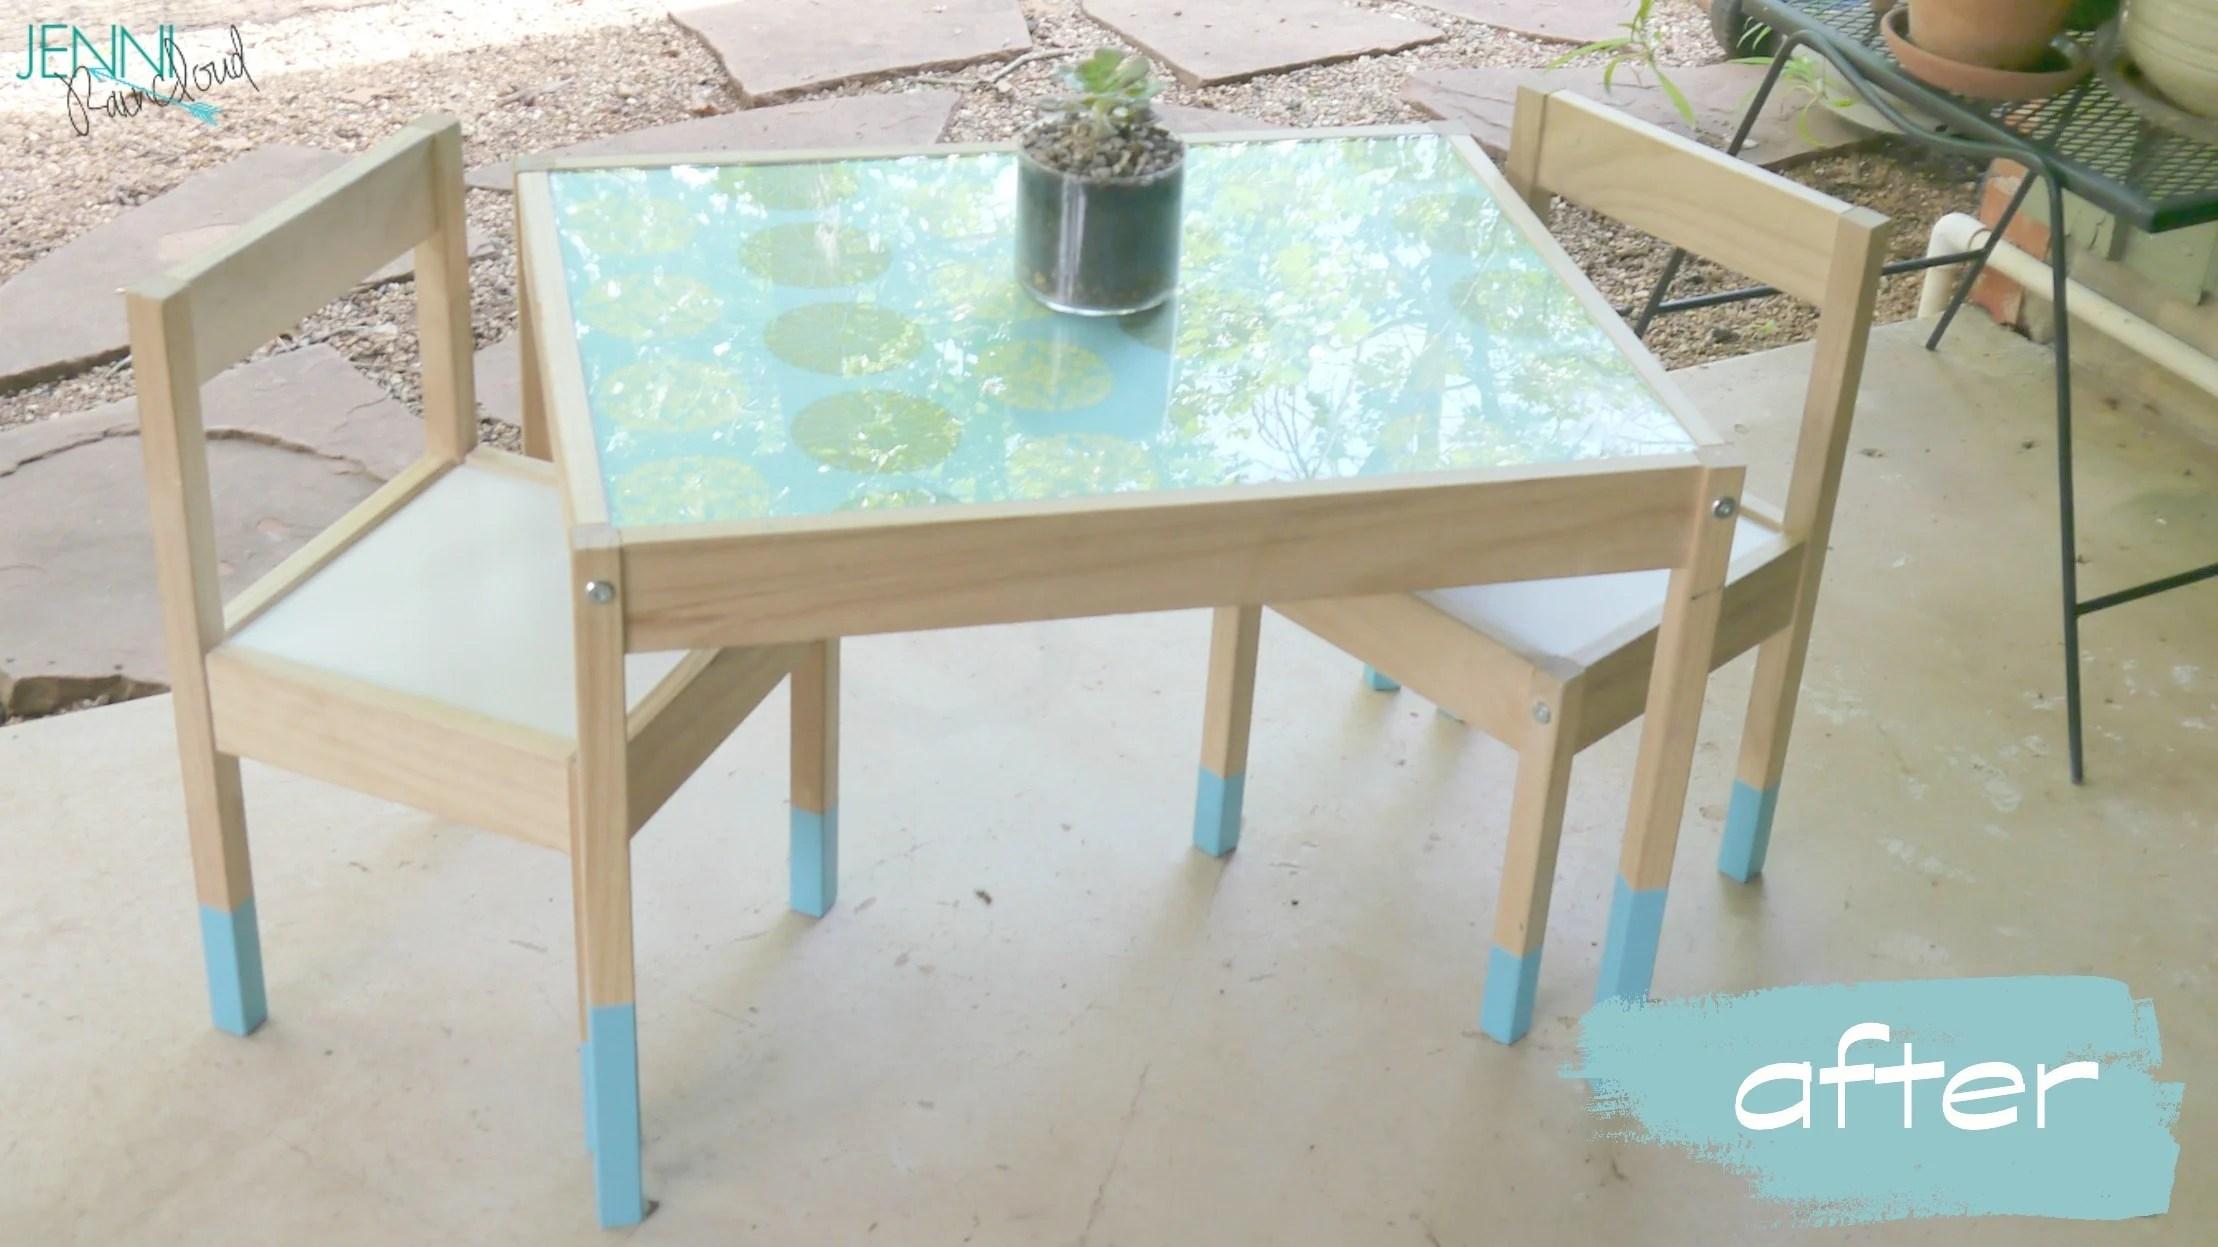 paint dipped children 39 s table easy ikea hack jenni raincloud. Black Bedroom Furniture Sets. Home Design Ideas